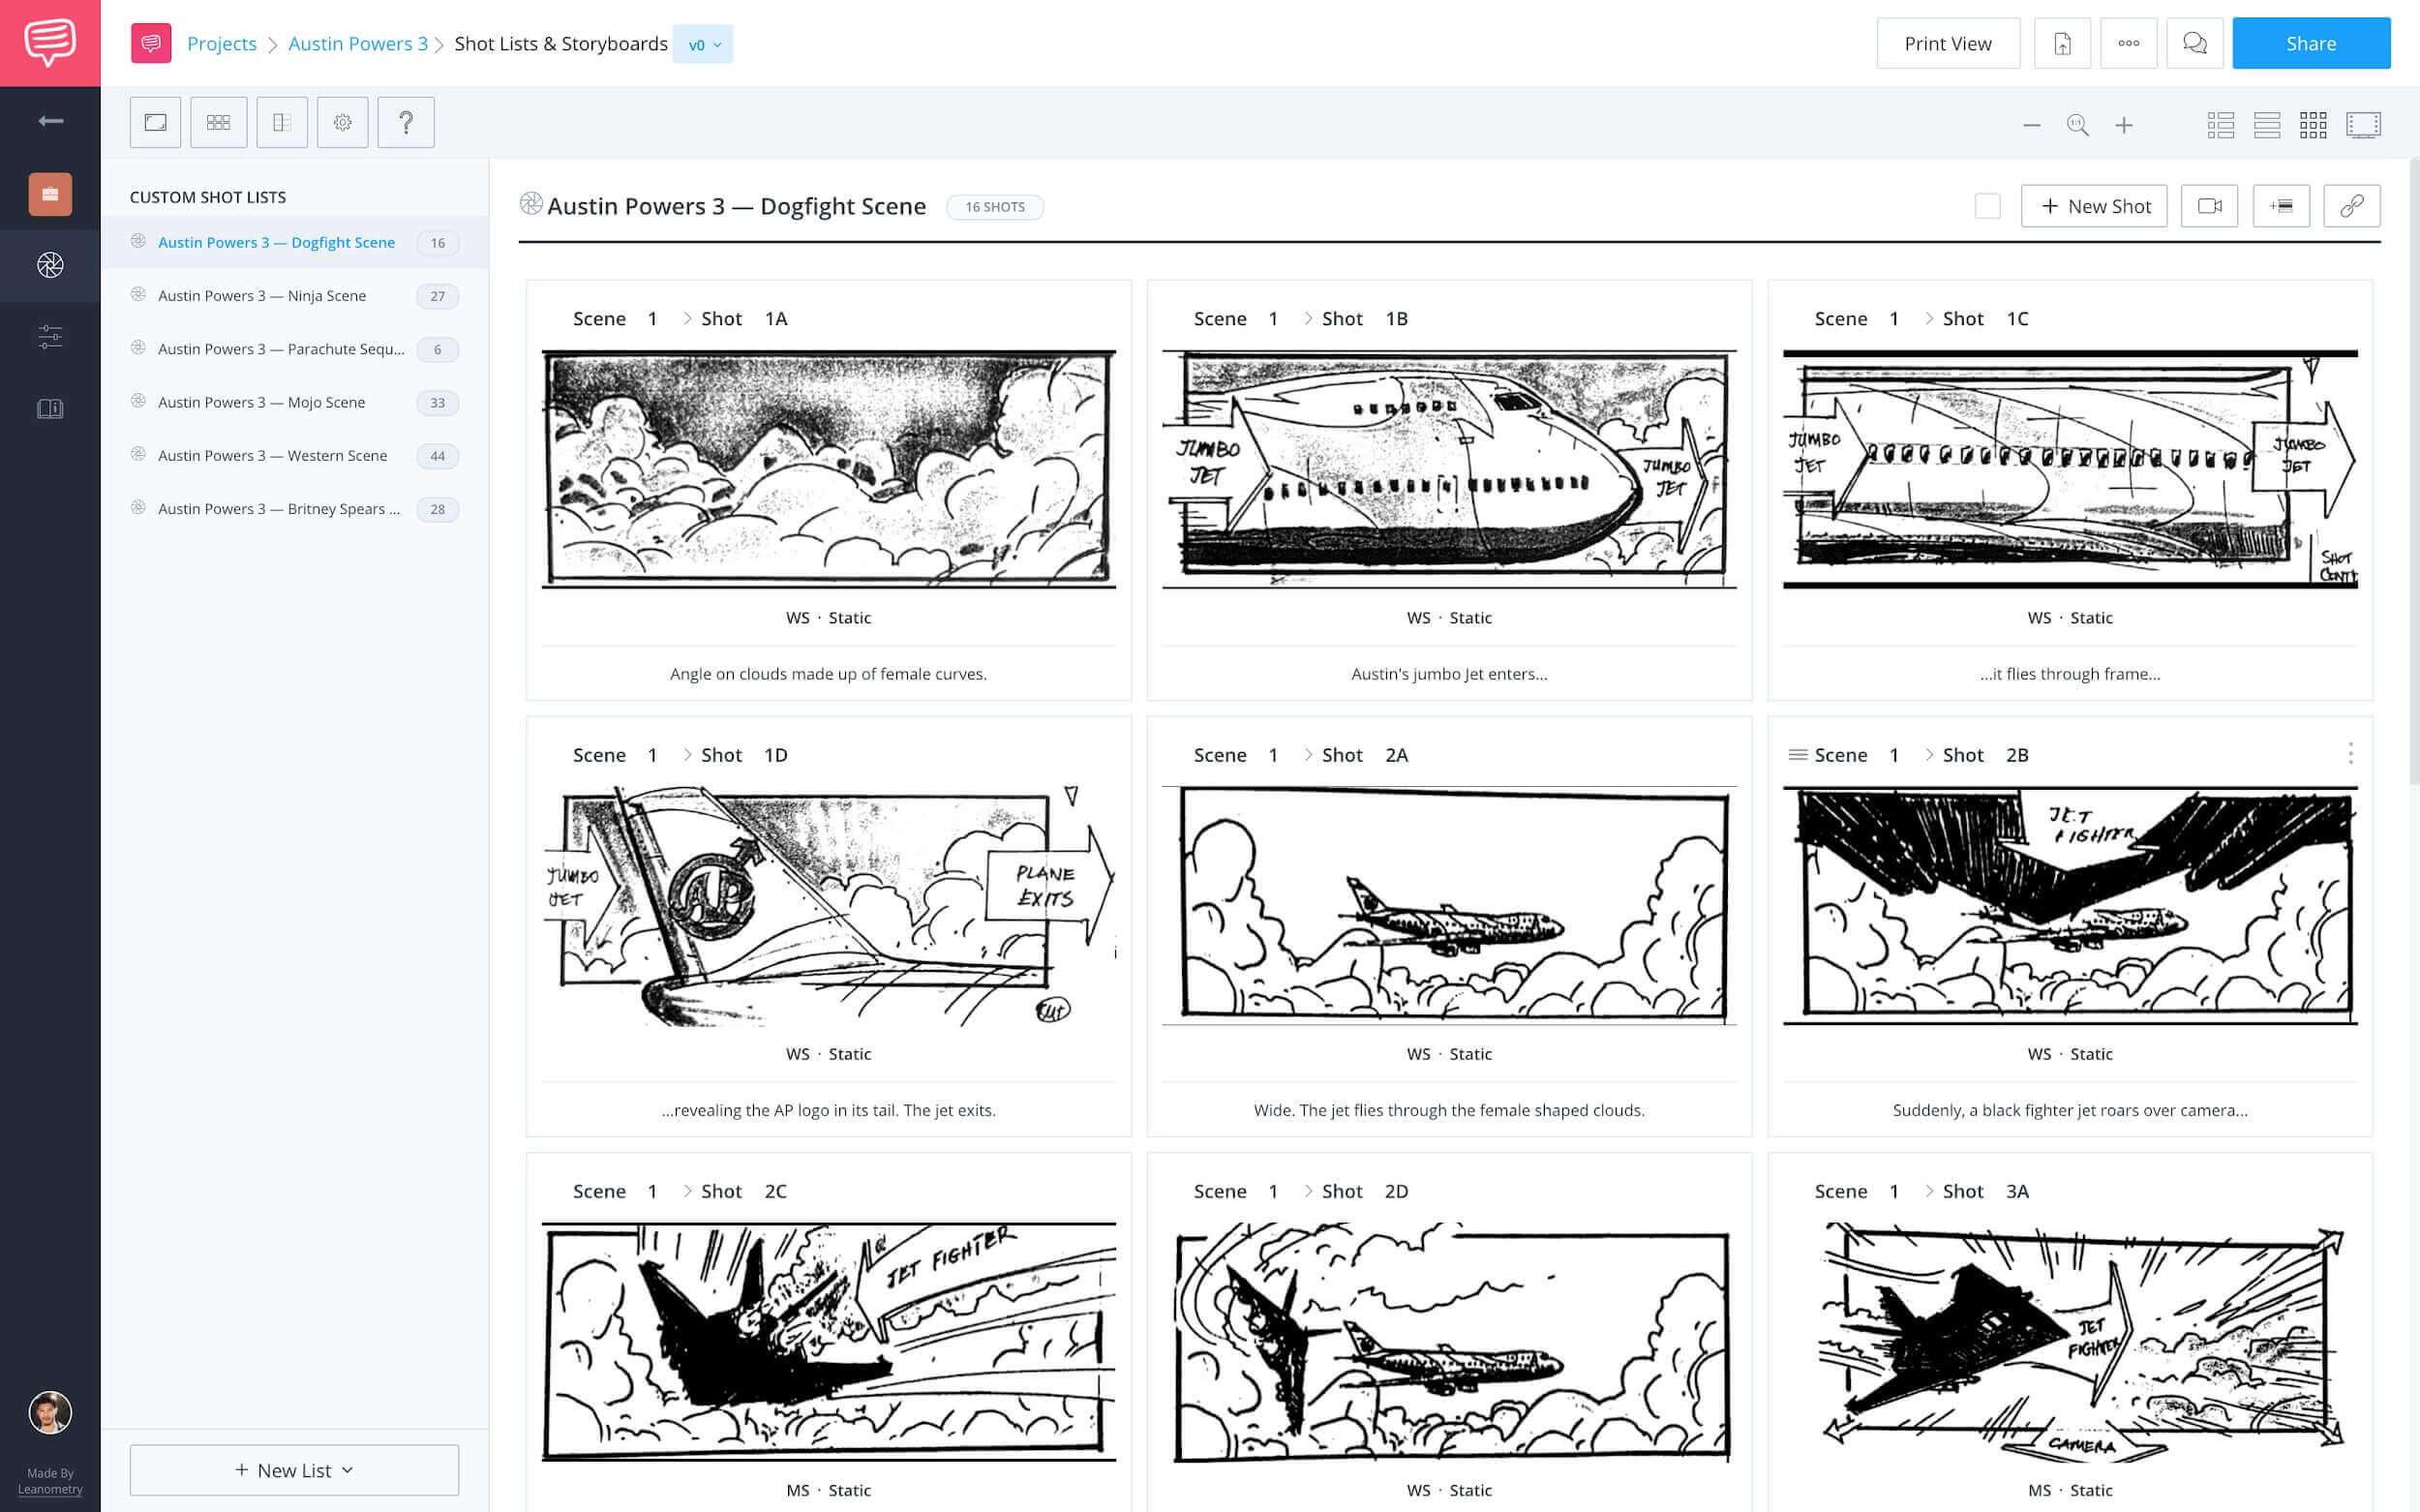 How to Shot List Faster in StudioBinder - Storyboard View - Studio Binder Shot Listing Software